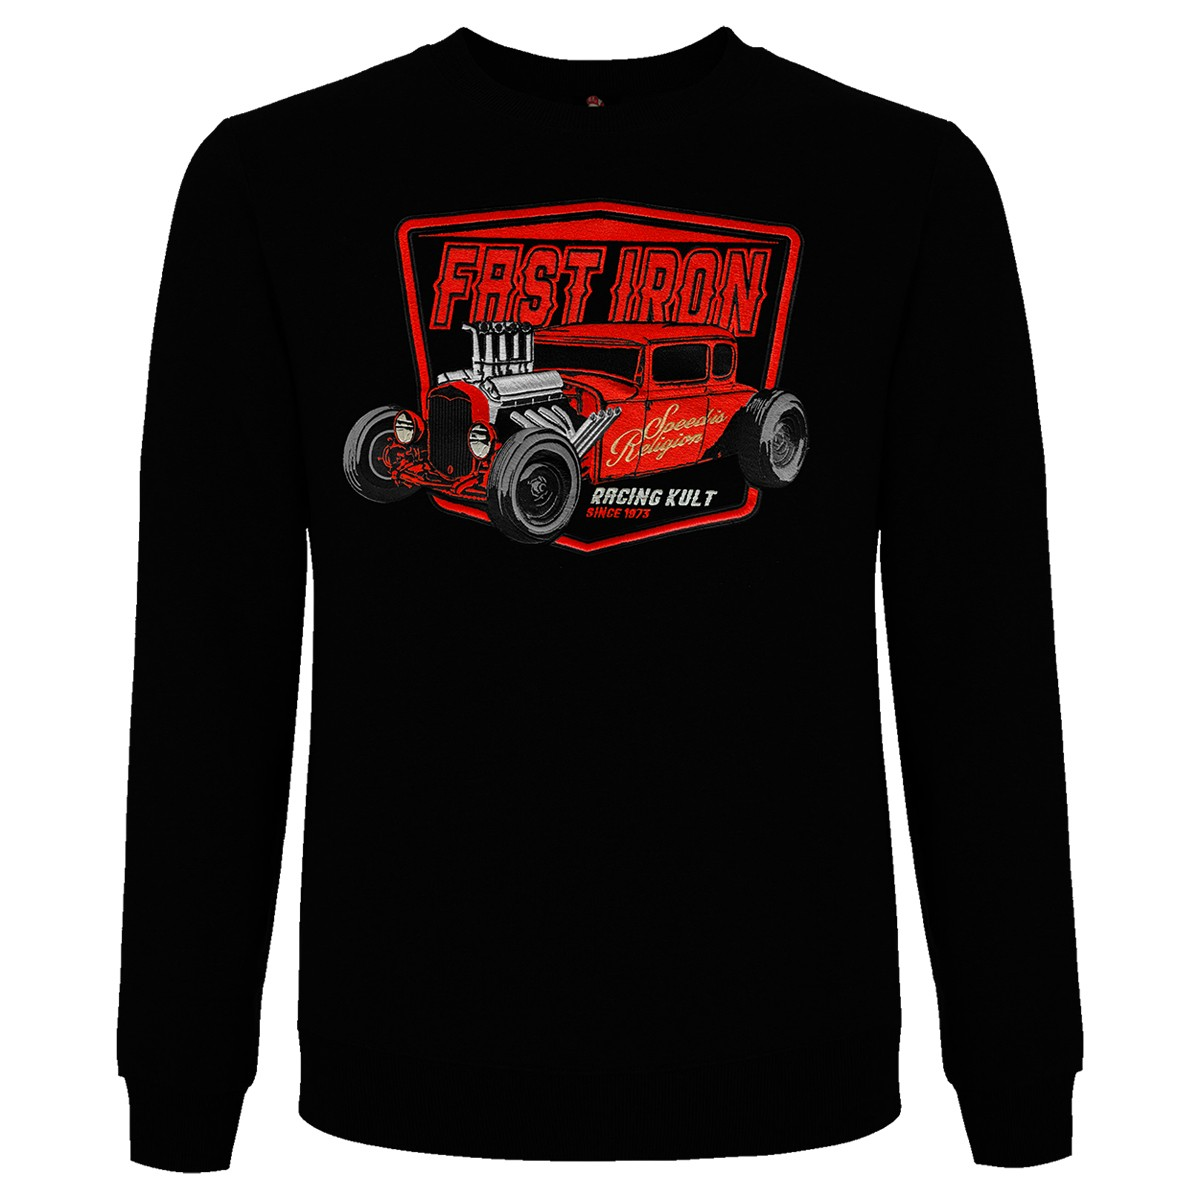 Racing Kult Sweatshirt Fast Iron mit Stick